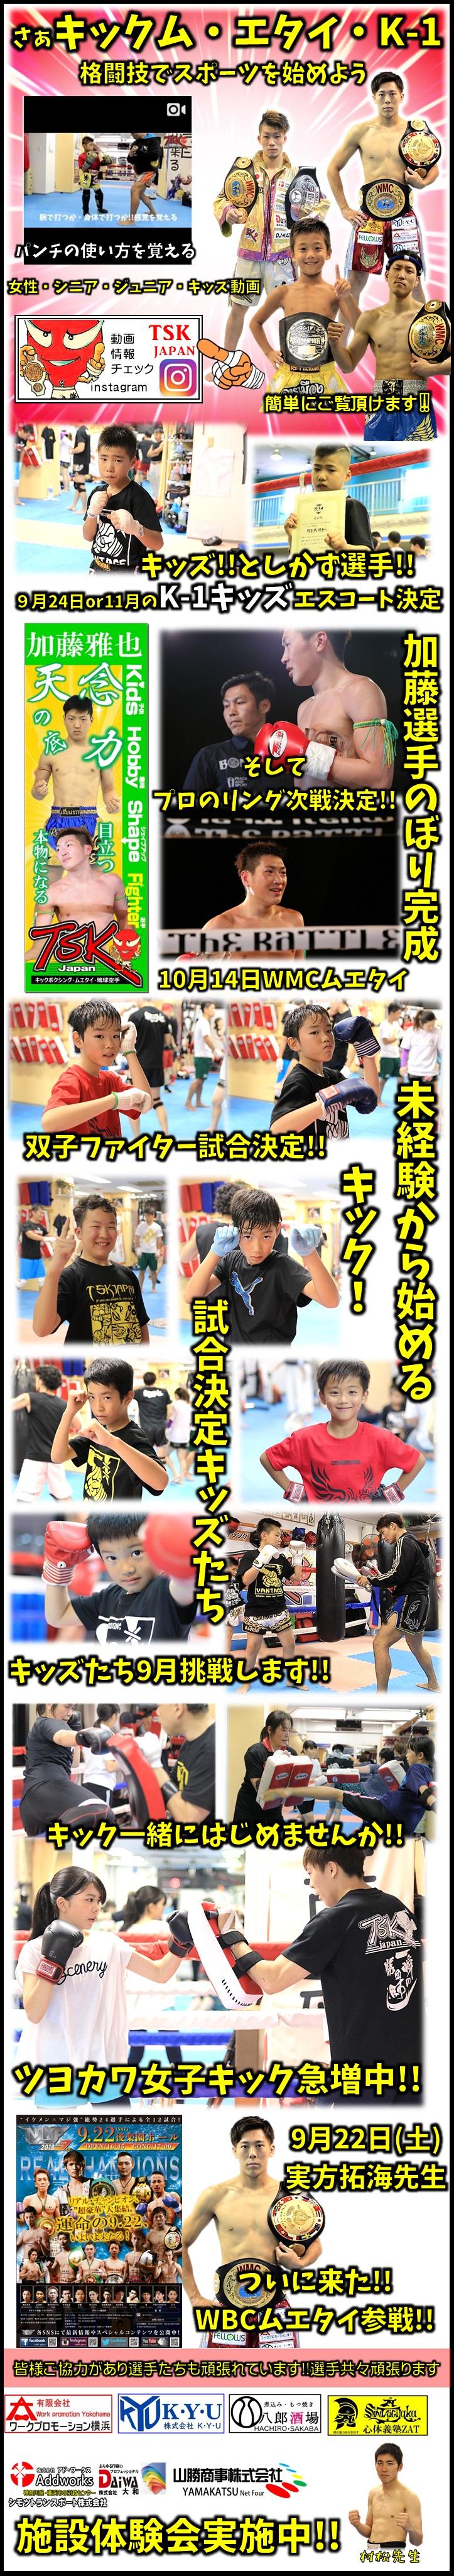 TSKjapan代表 勝山泰士 横浜 子供 女子 キックボクシングジム TSKjapan 新K-1伝説 Krush ムエタイ KNOCK OUT